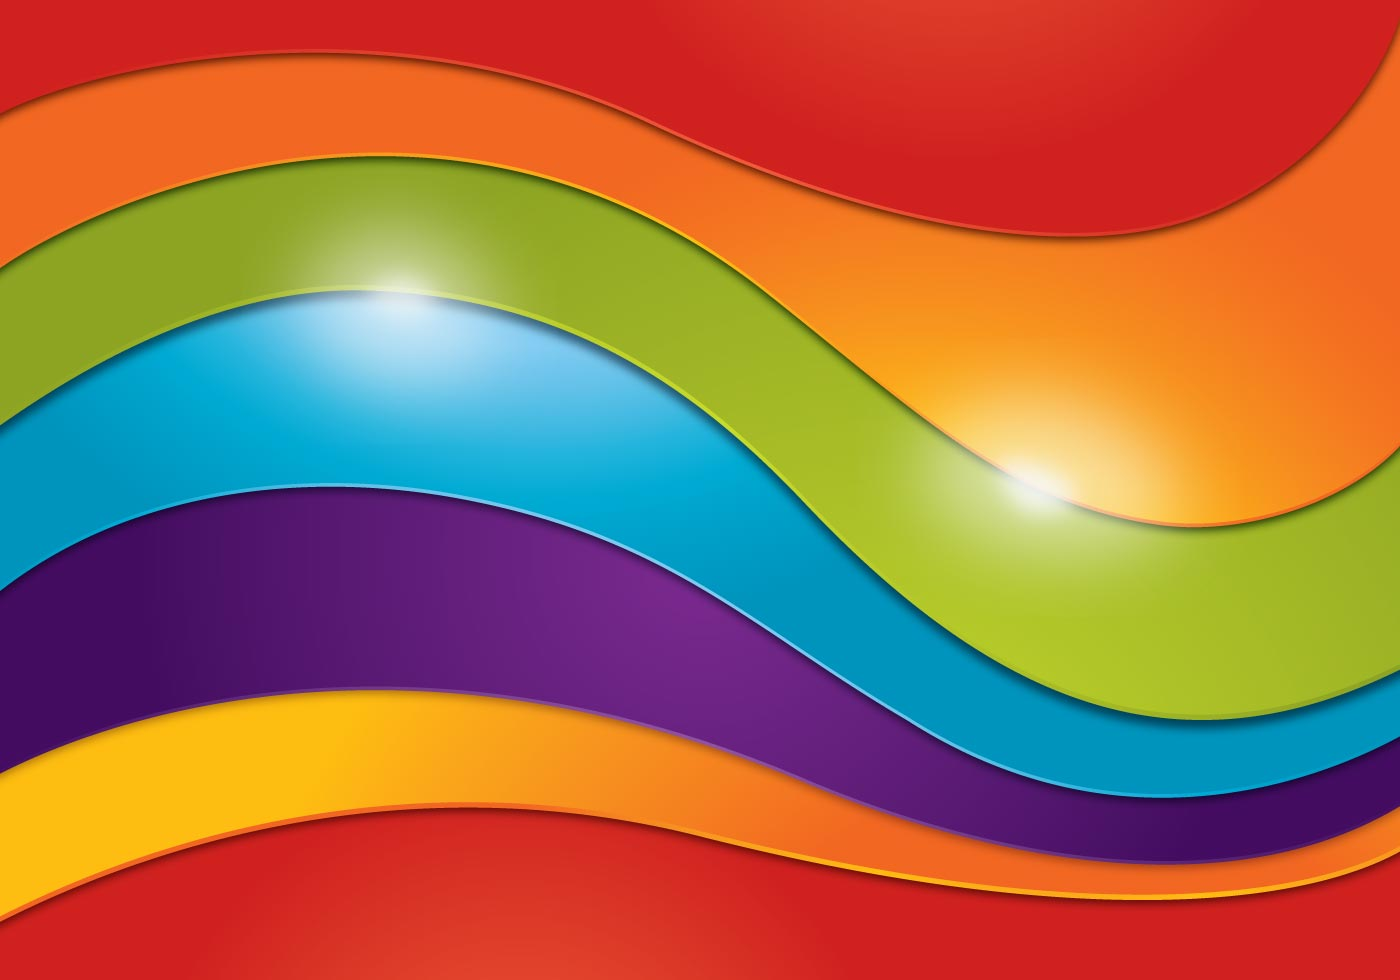 Wavy Rainbow Background - Download Free Vector Art, Stock ...